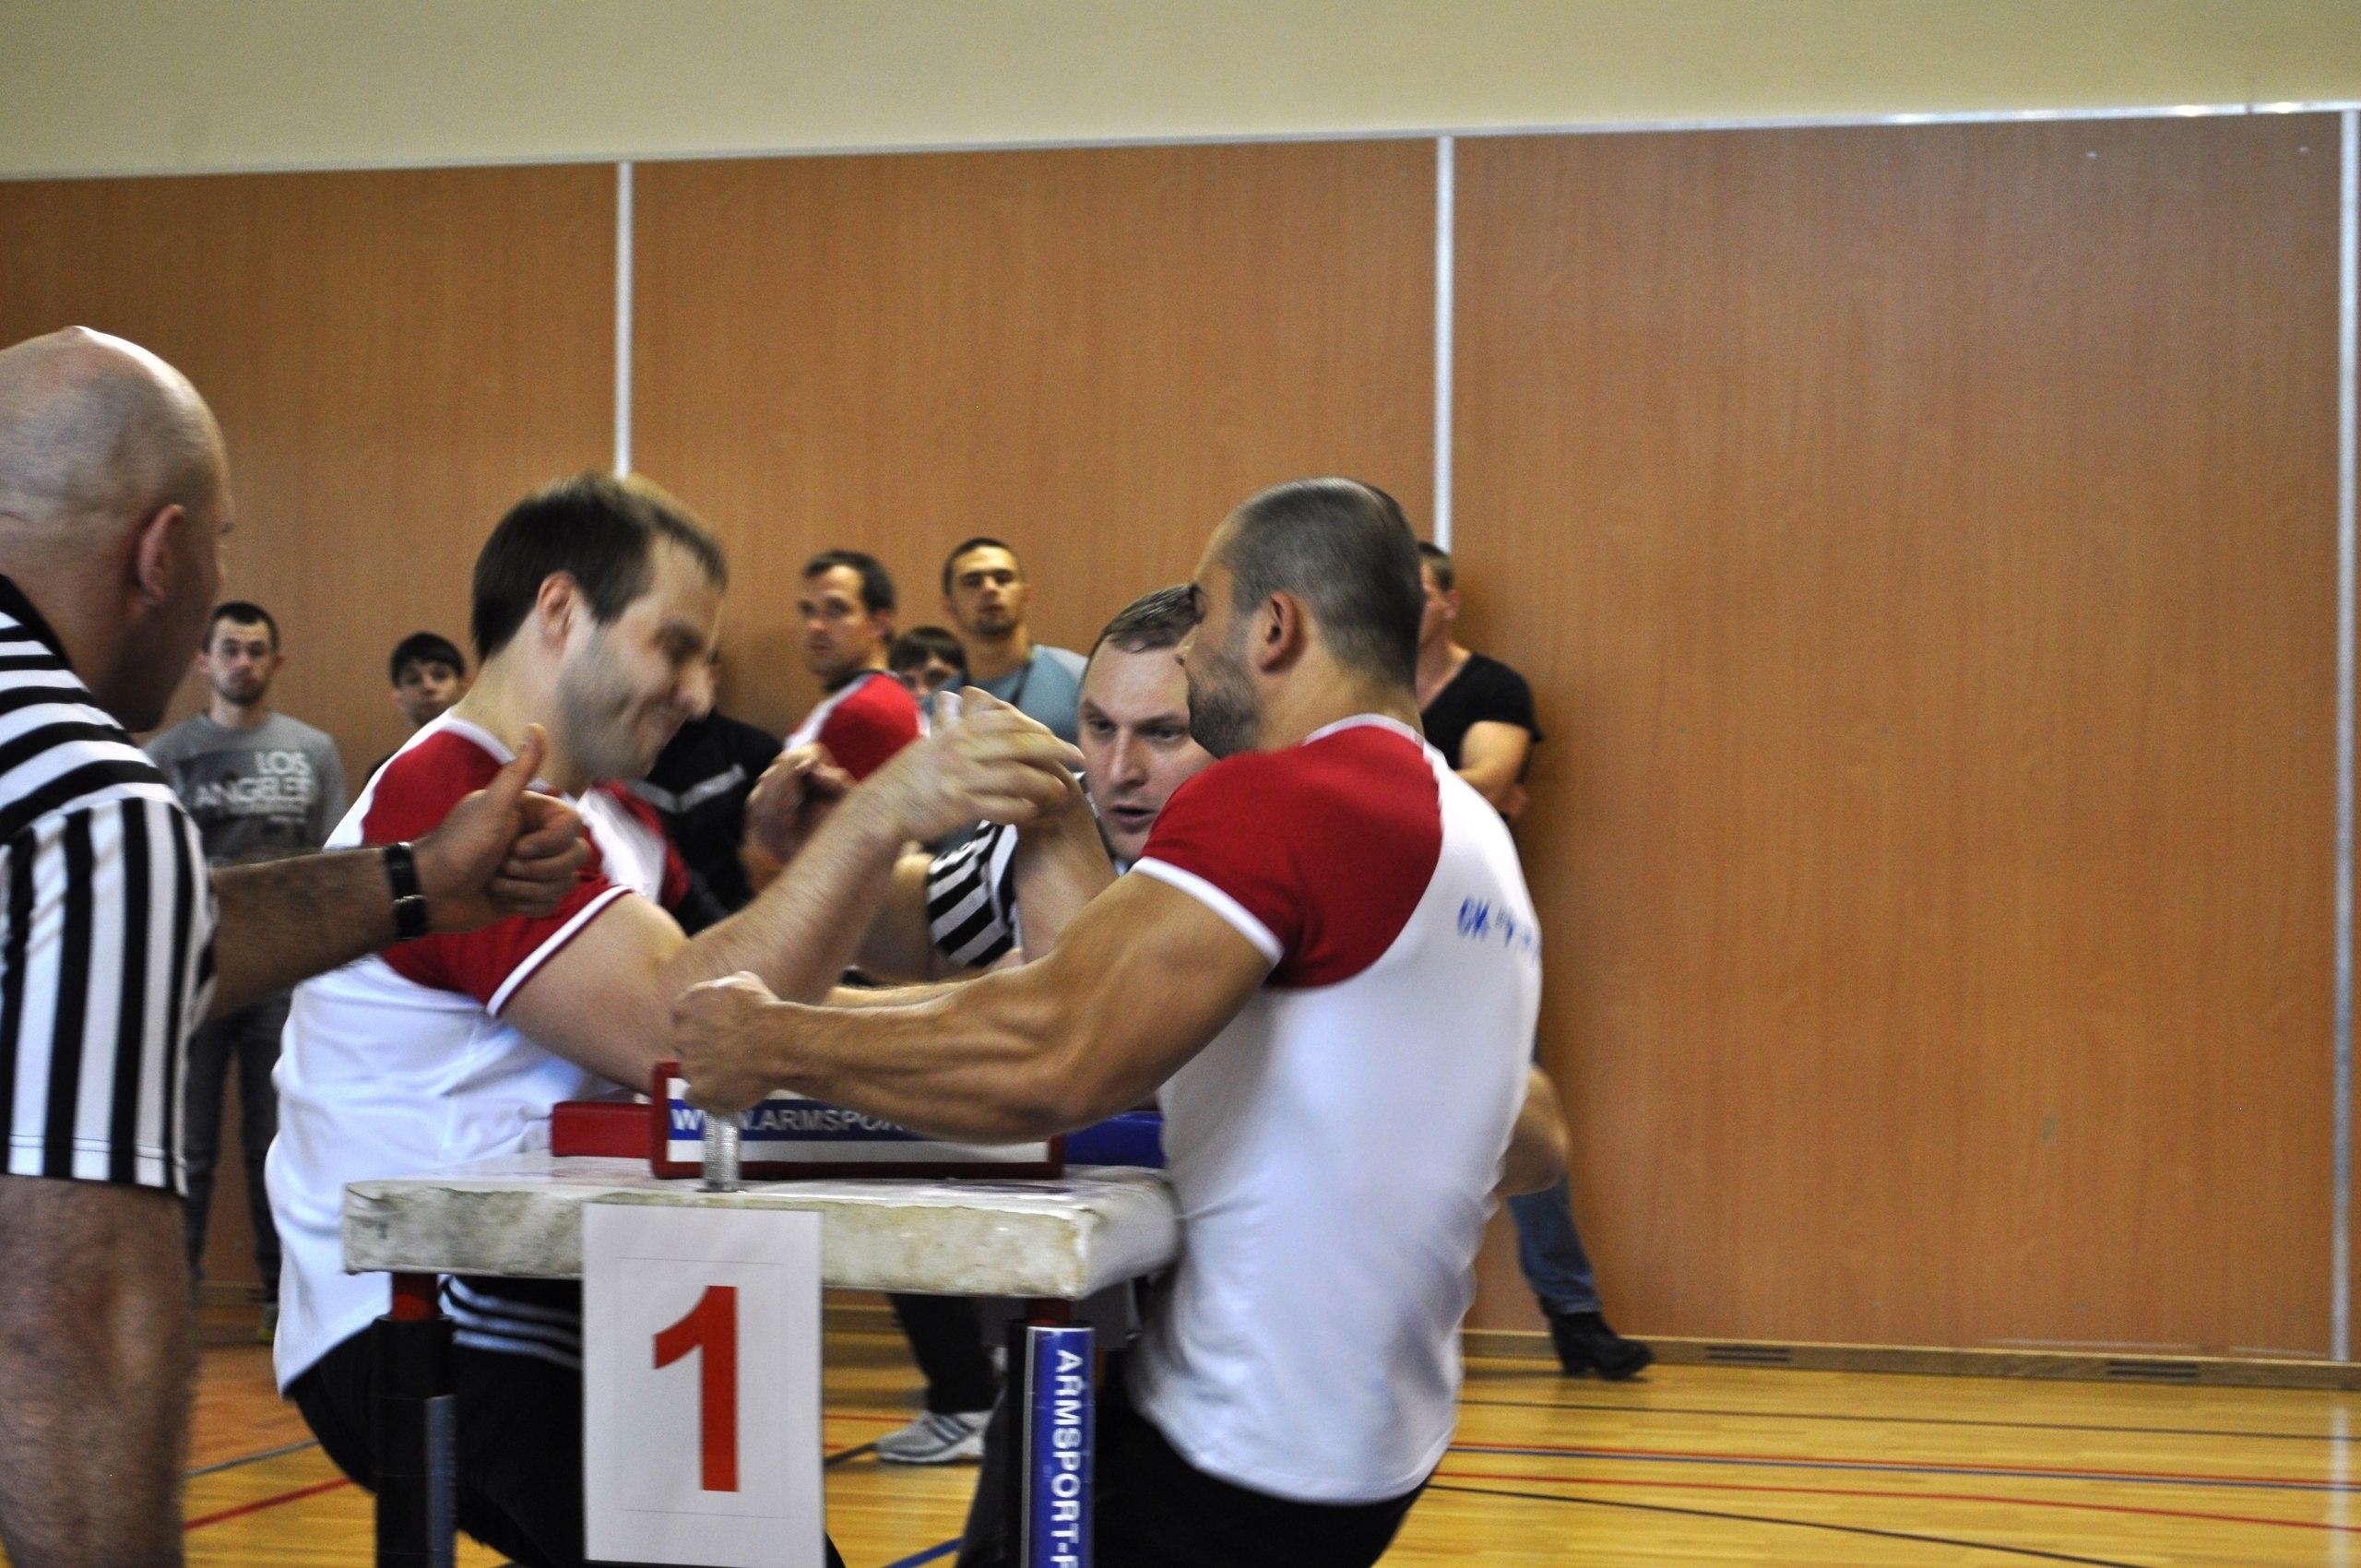 Ivan Matyushenko vs. Arsen Liliev │ Moscow Armwrestling Championship 2012 │14 – 15 December 2012